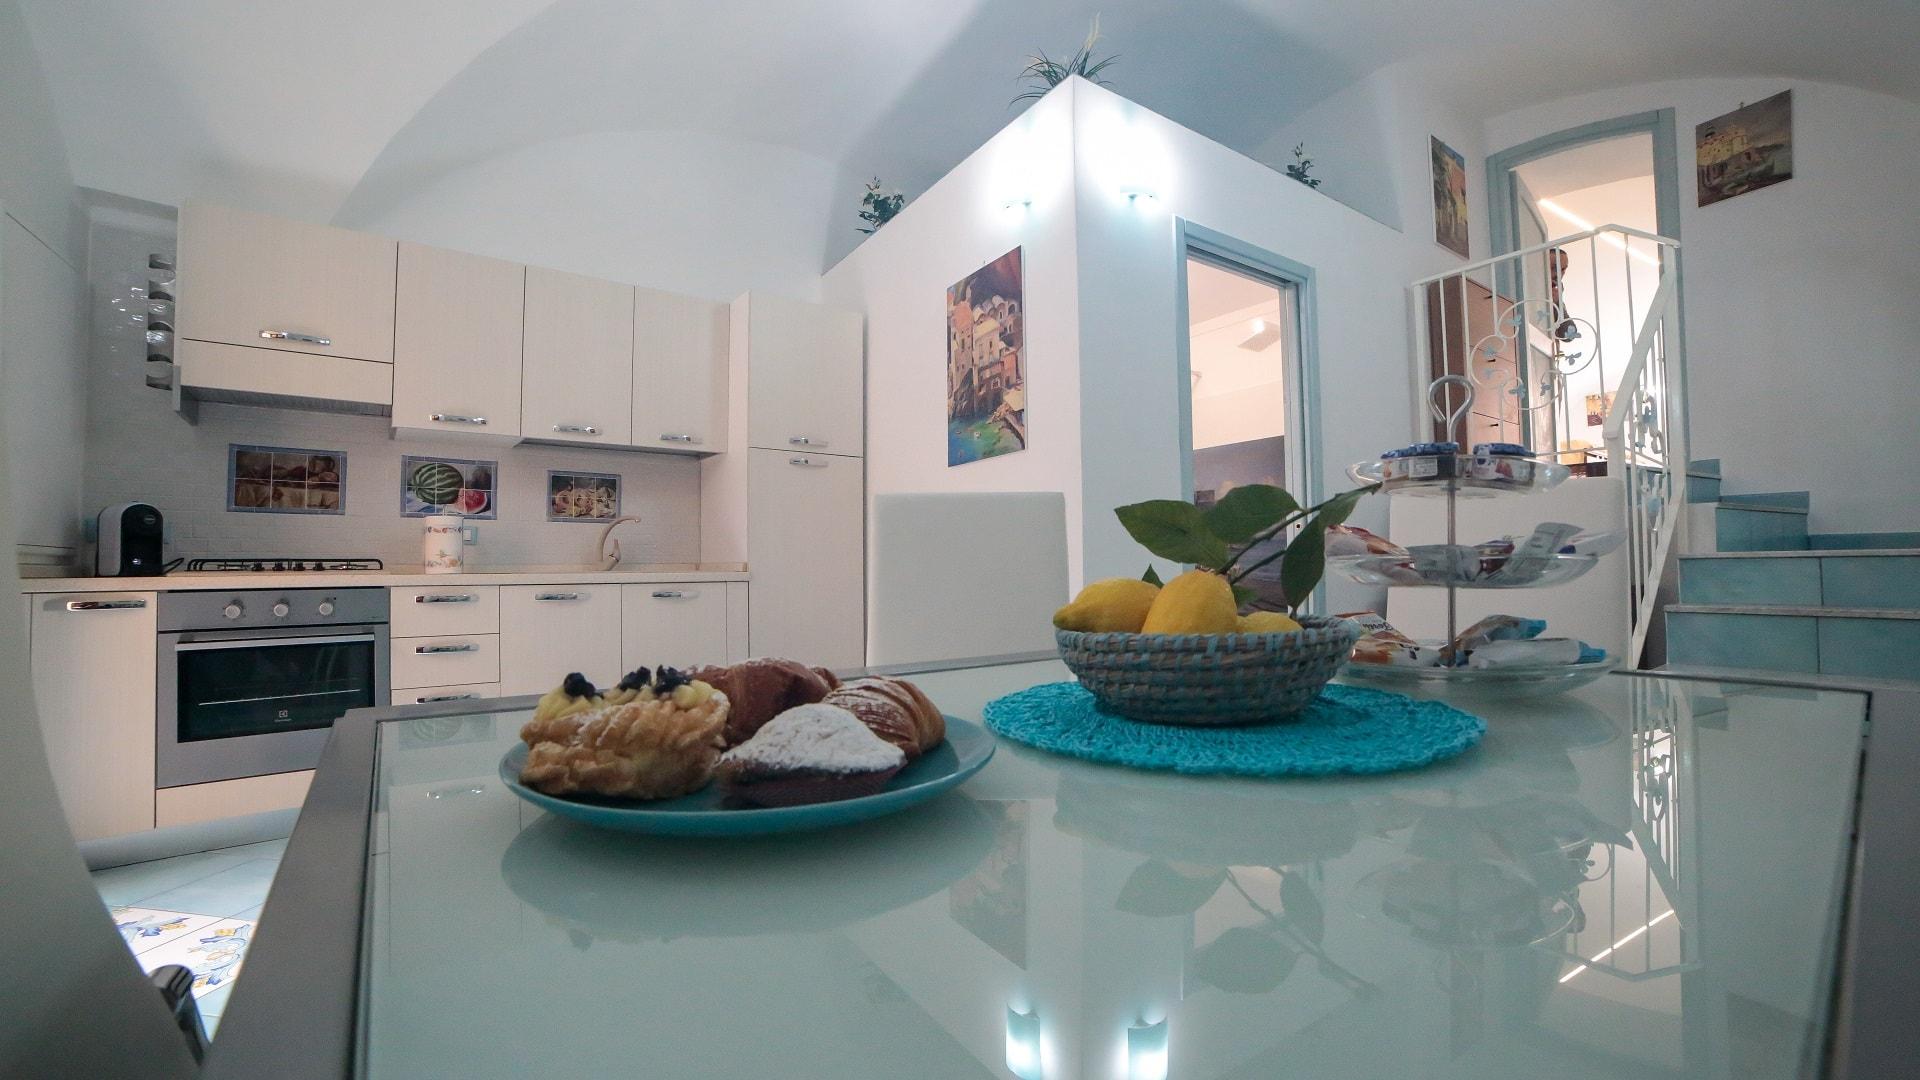 Appartamenti costiera amalfitana qualeatalian amalfi coast for Appartamenti amalfi